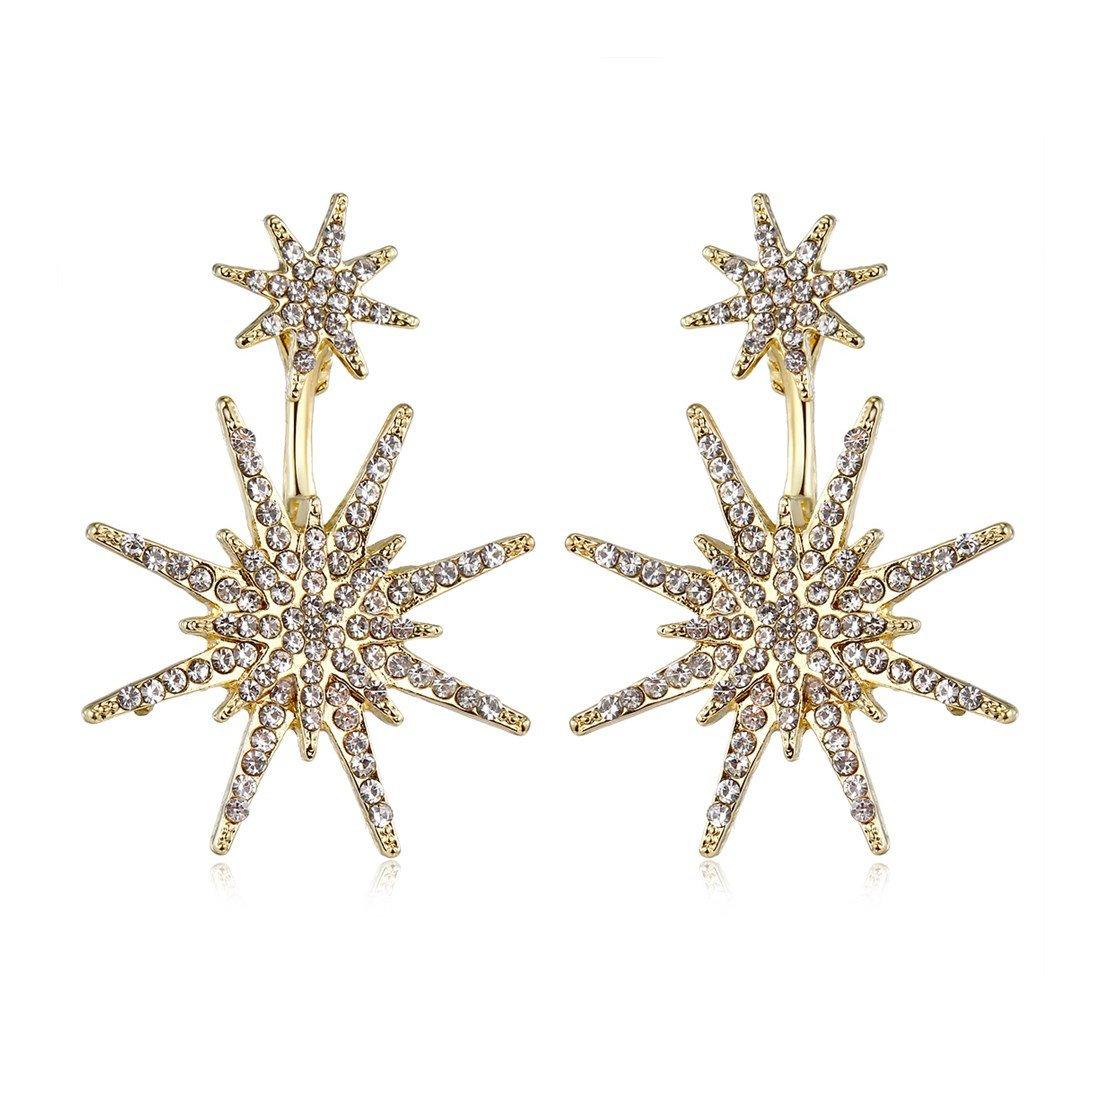 Star Stud Unique Gold Dangling Earrings for Women Fashion Wedding Ear Jacket Christmas Jewelry MengPa YH1254G